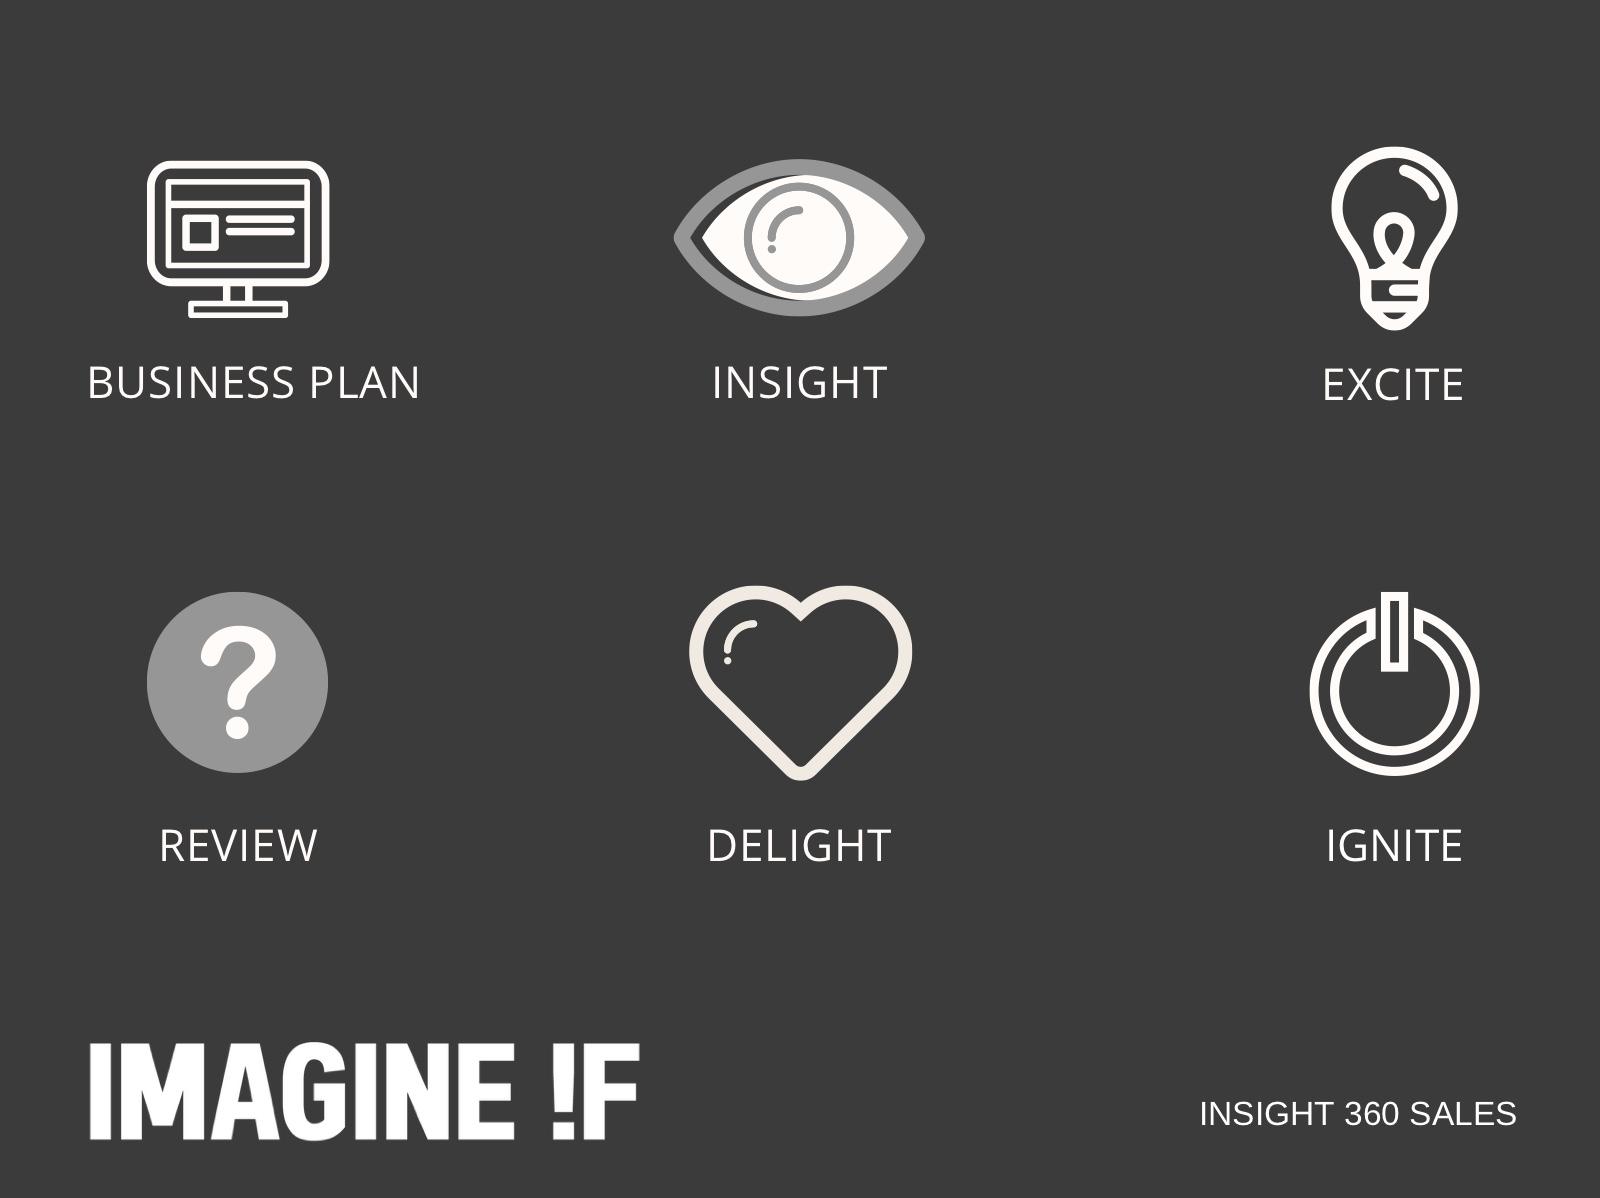 Copy-of-Insight-360-System-1-1.jpg